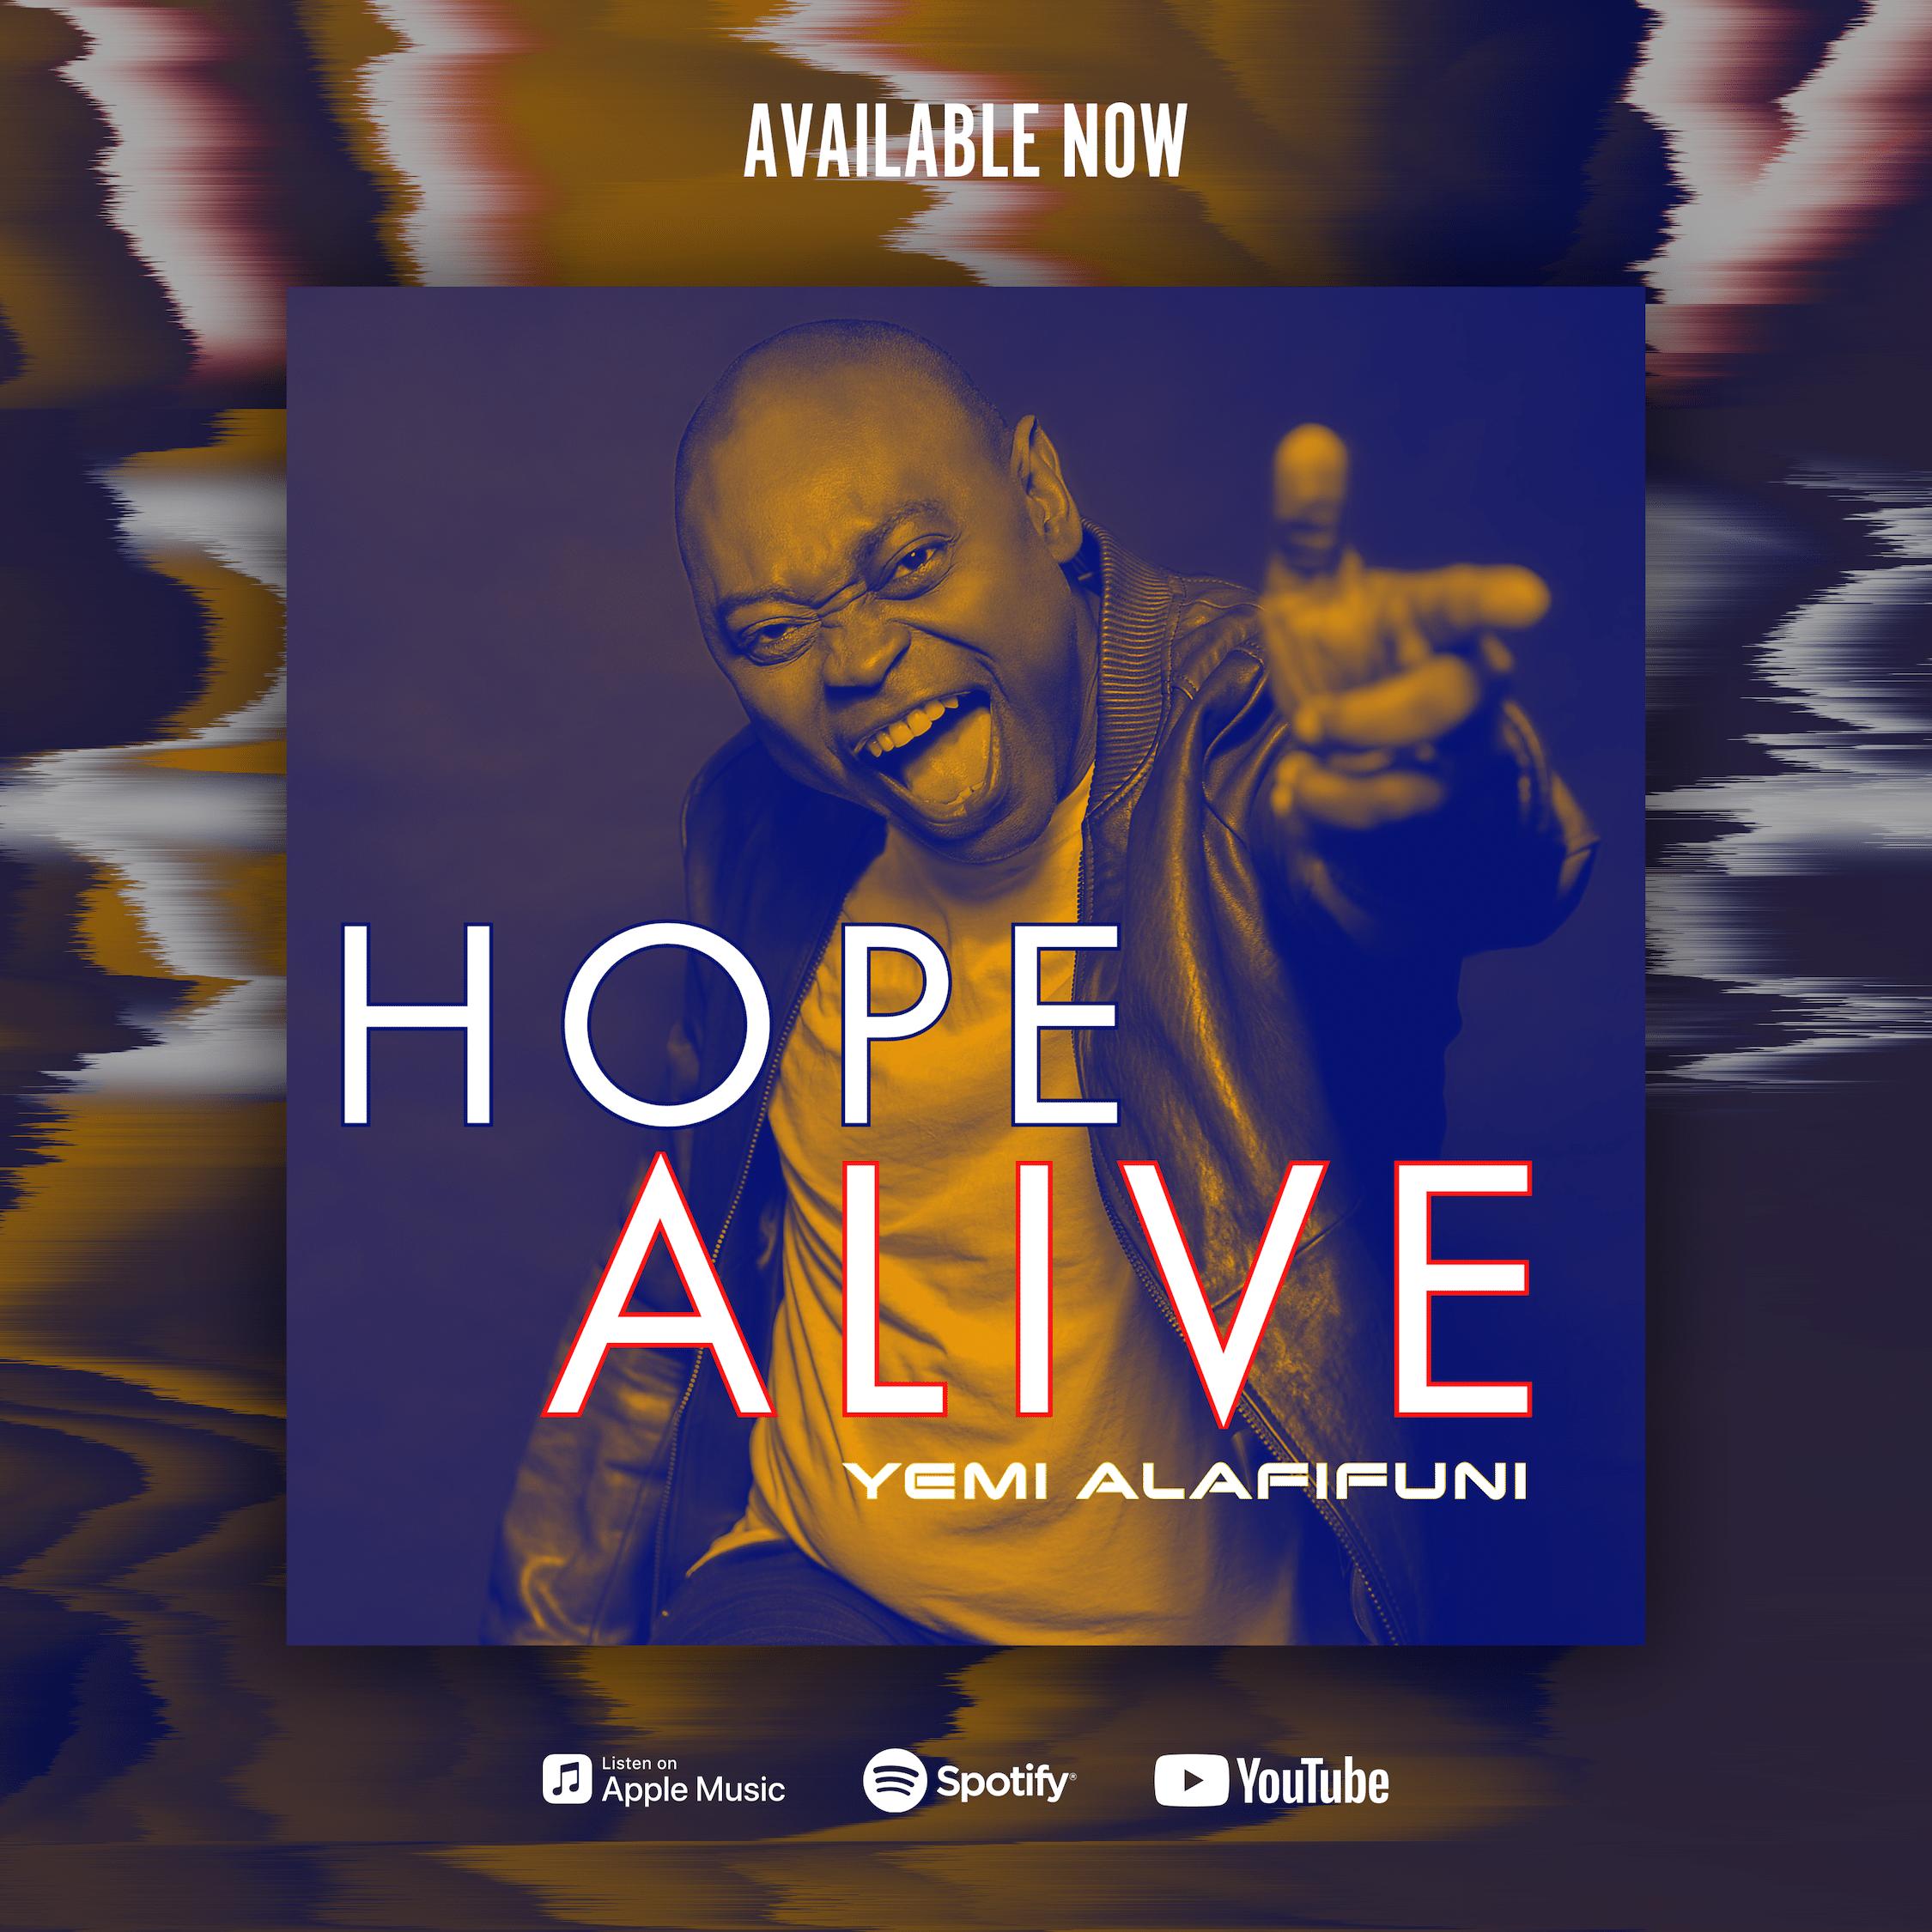 Yemi Alafifuni - Hope Alive